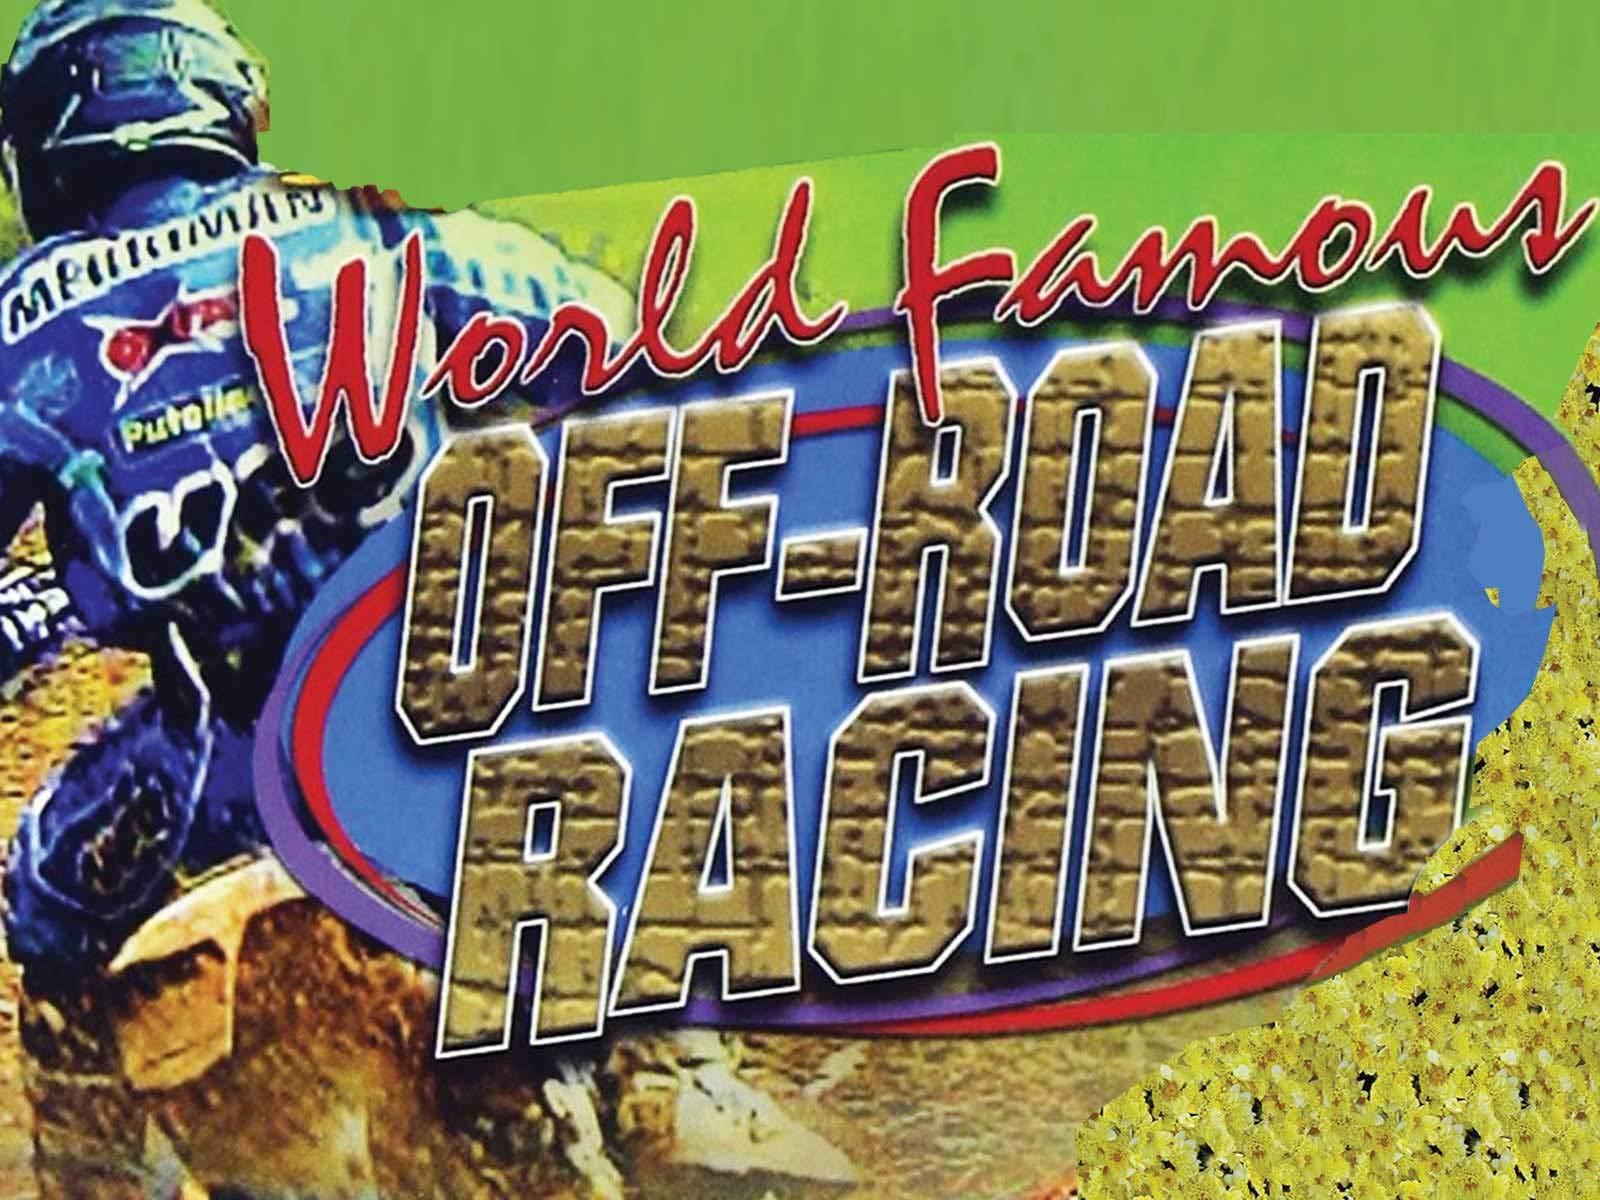 Off Road Racing World Enduro Championships - Season 1